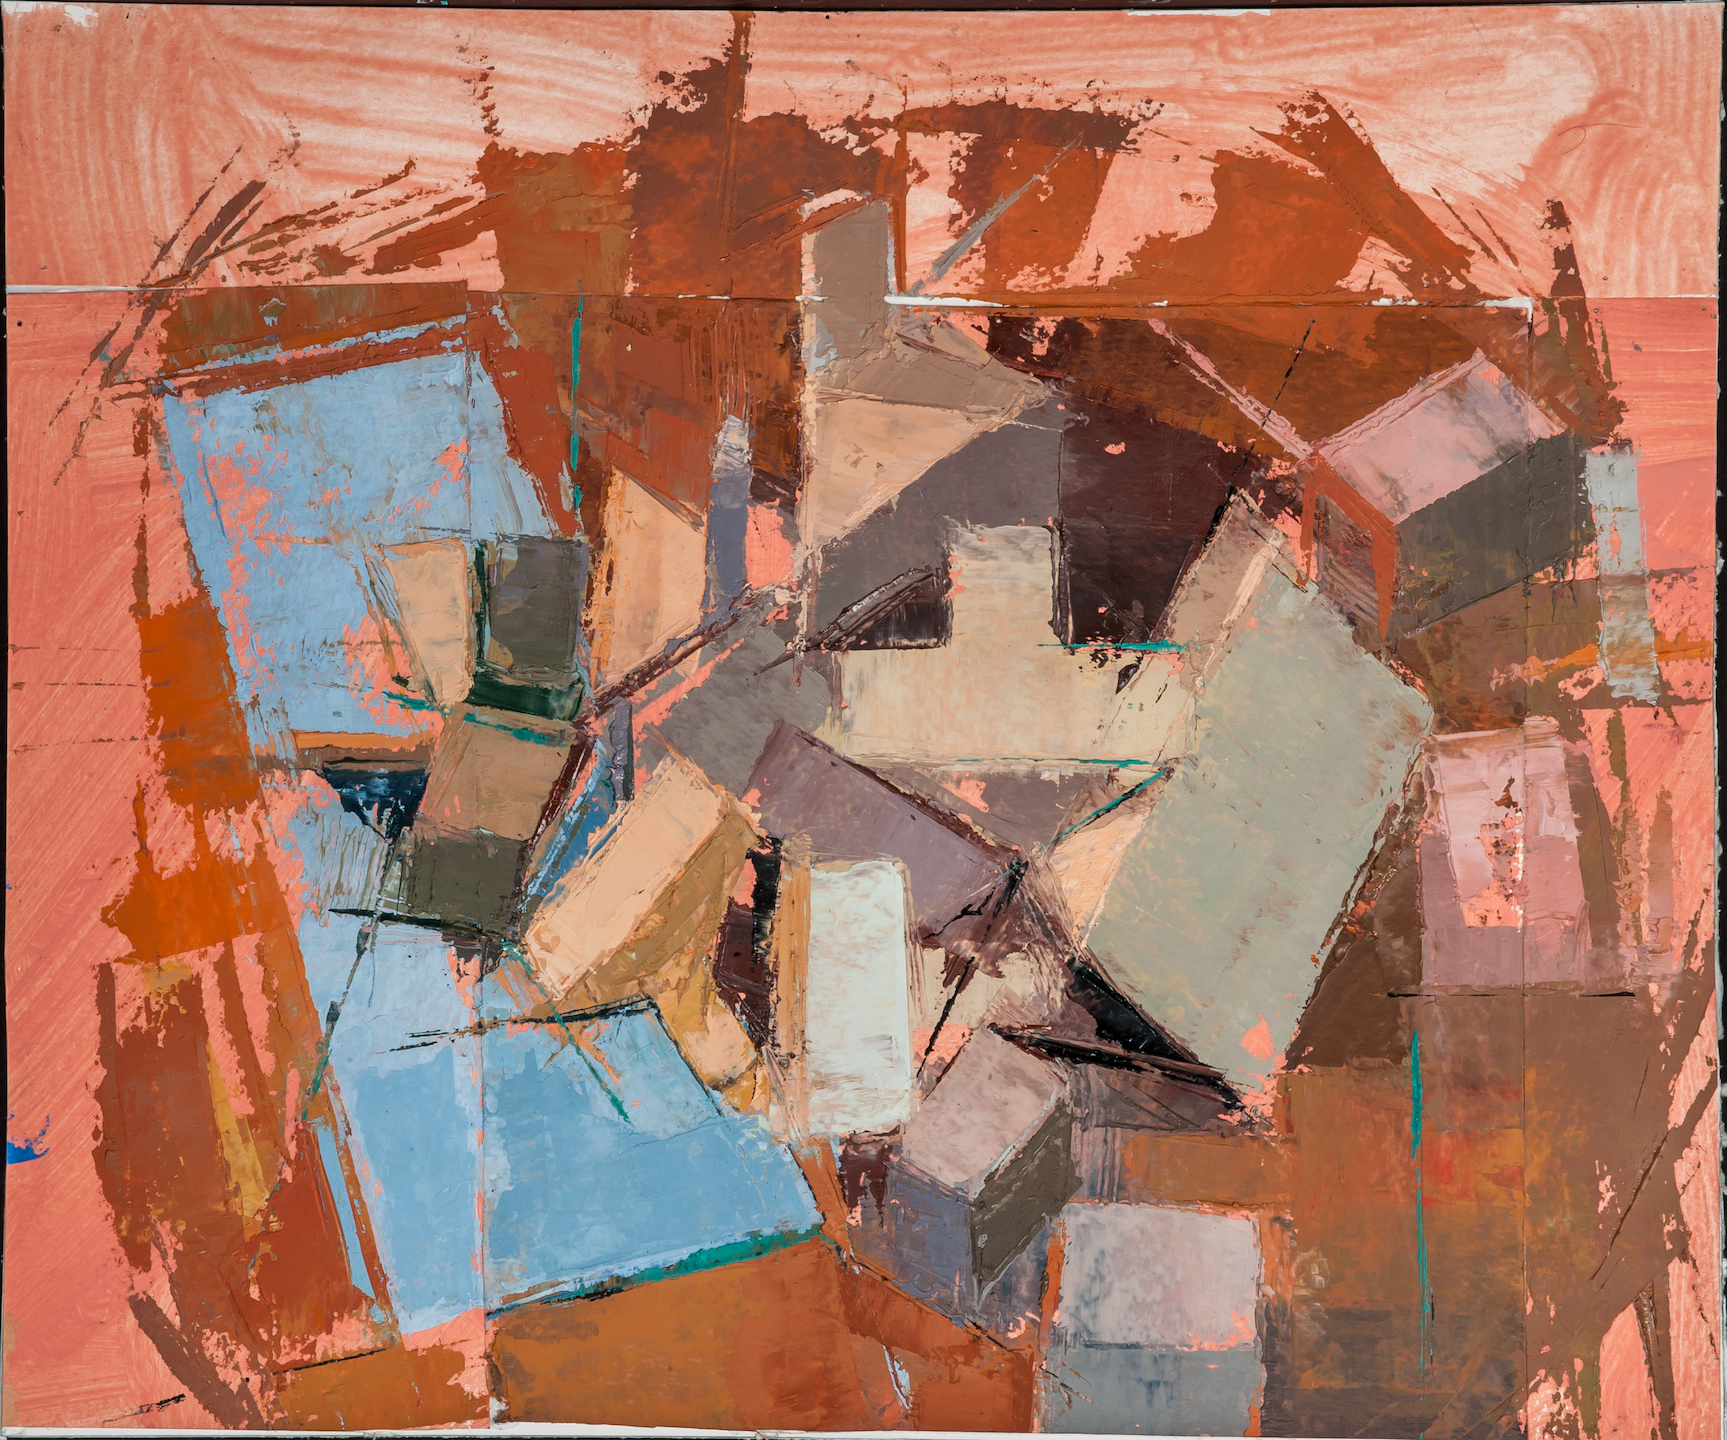 Blocks and Bones (Sketch), Paint on Paper 9 x 12 Jesse Thomas